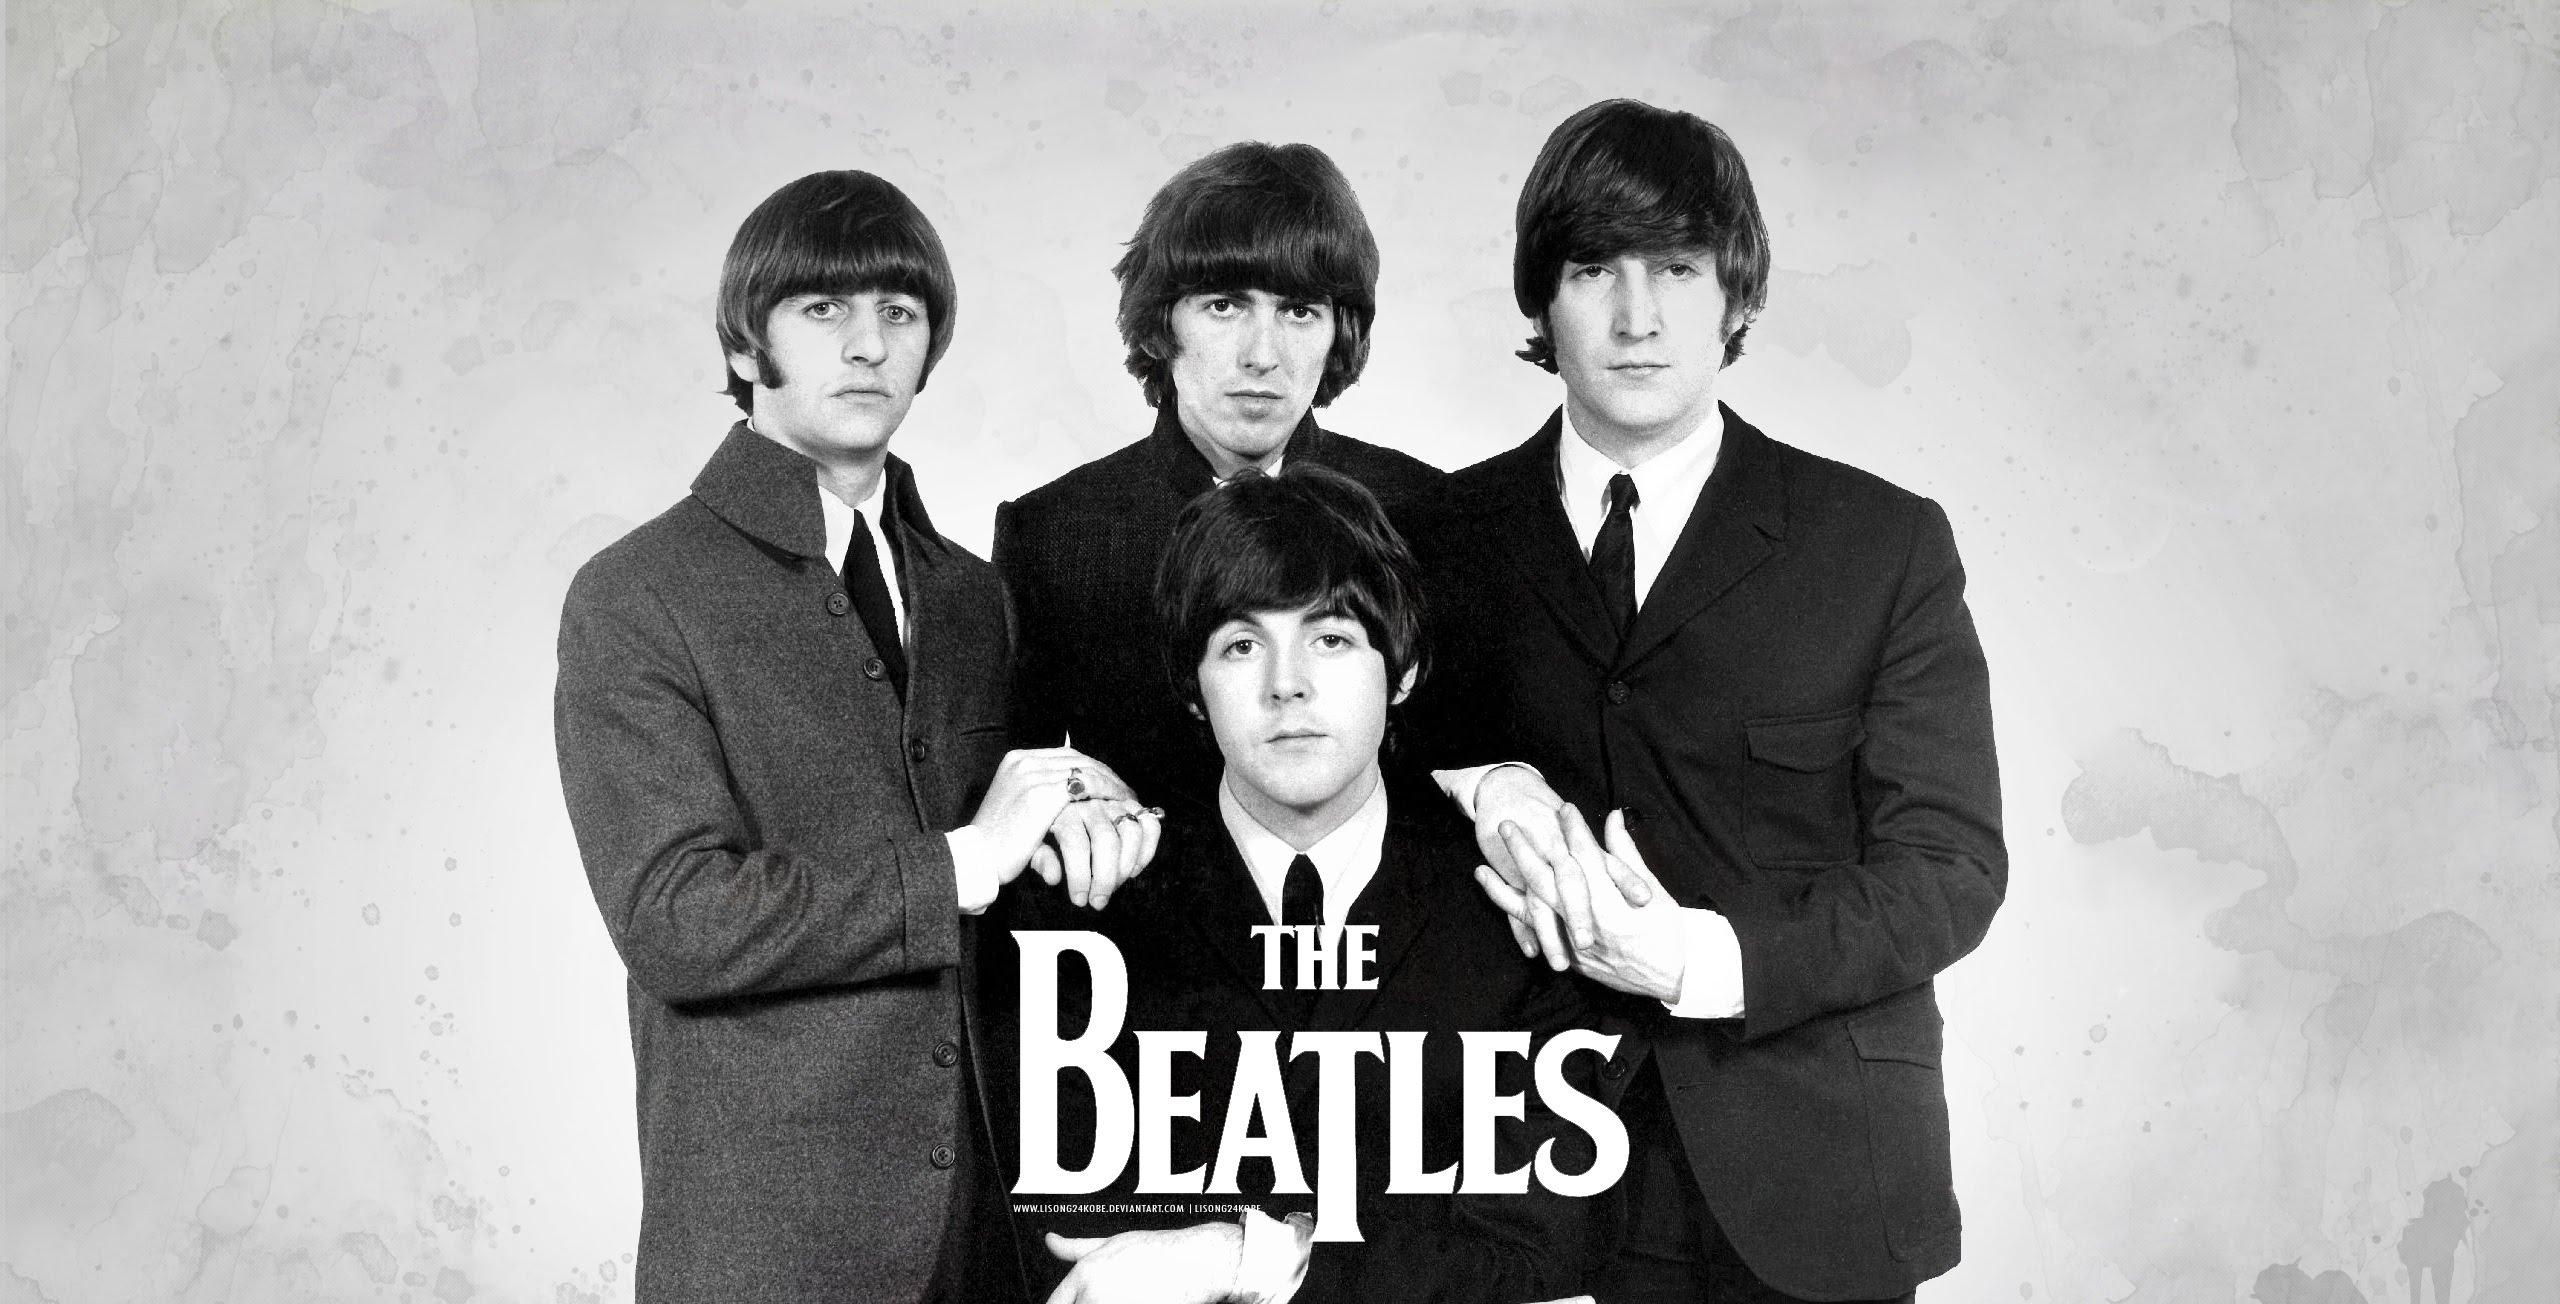 Música   The Beatles para bebés no CCM